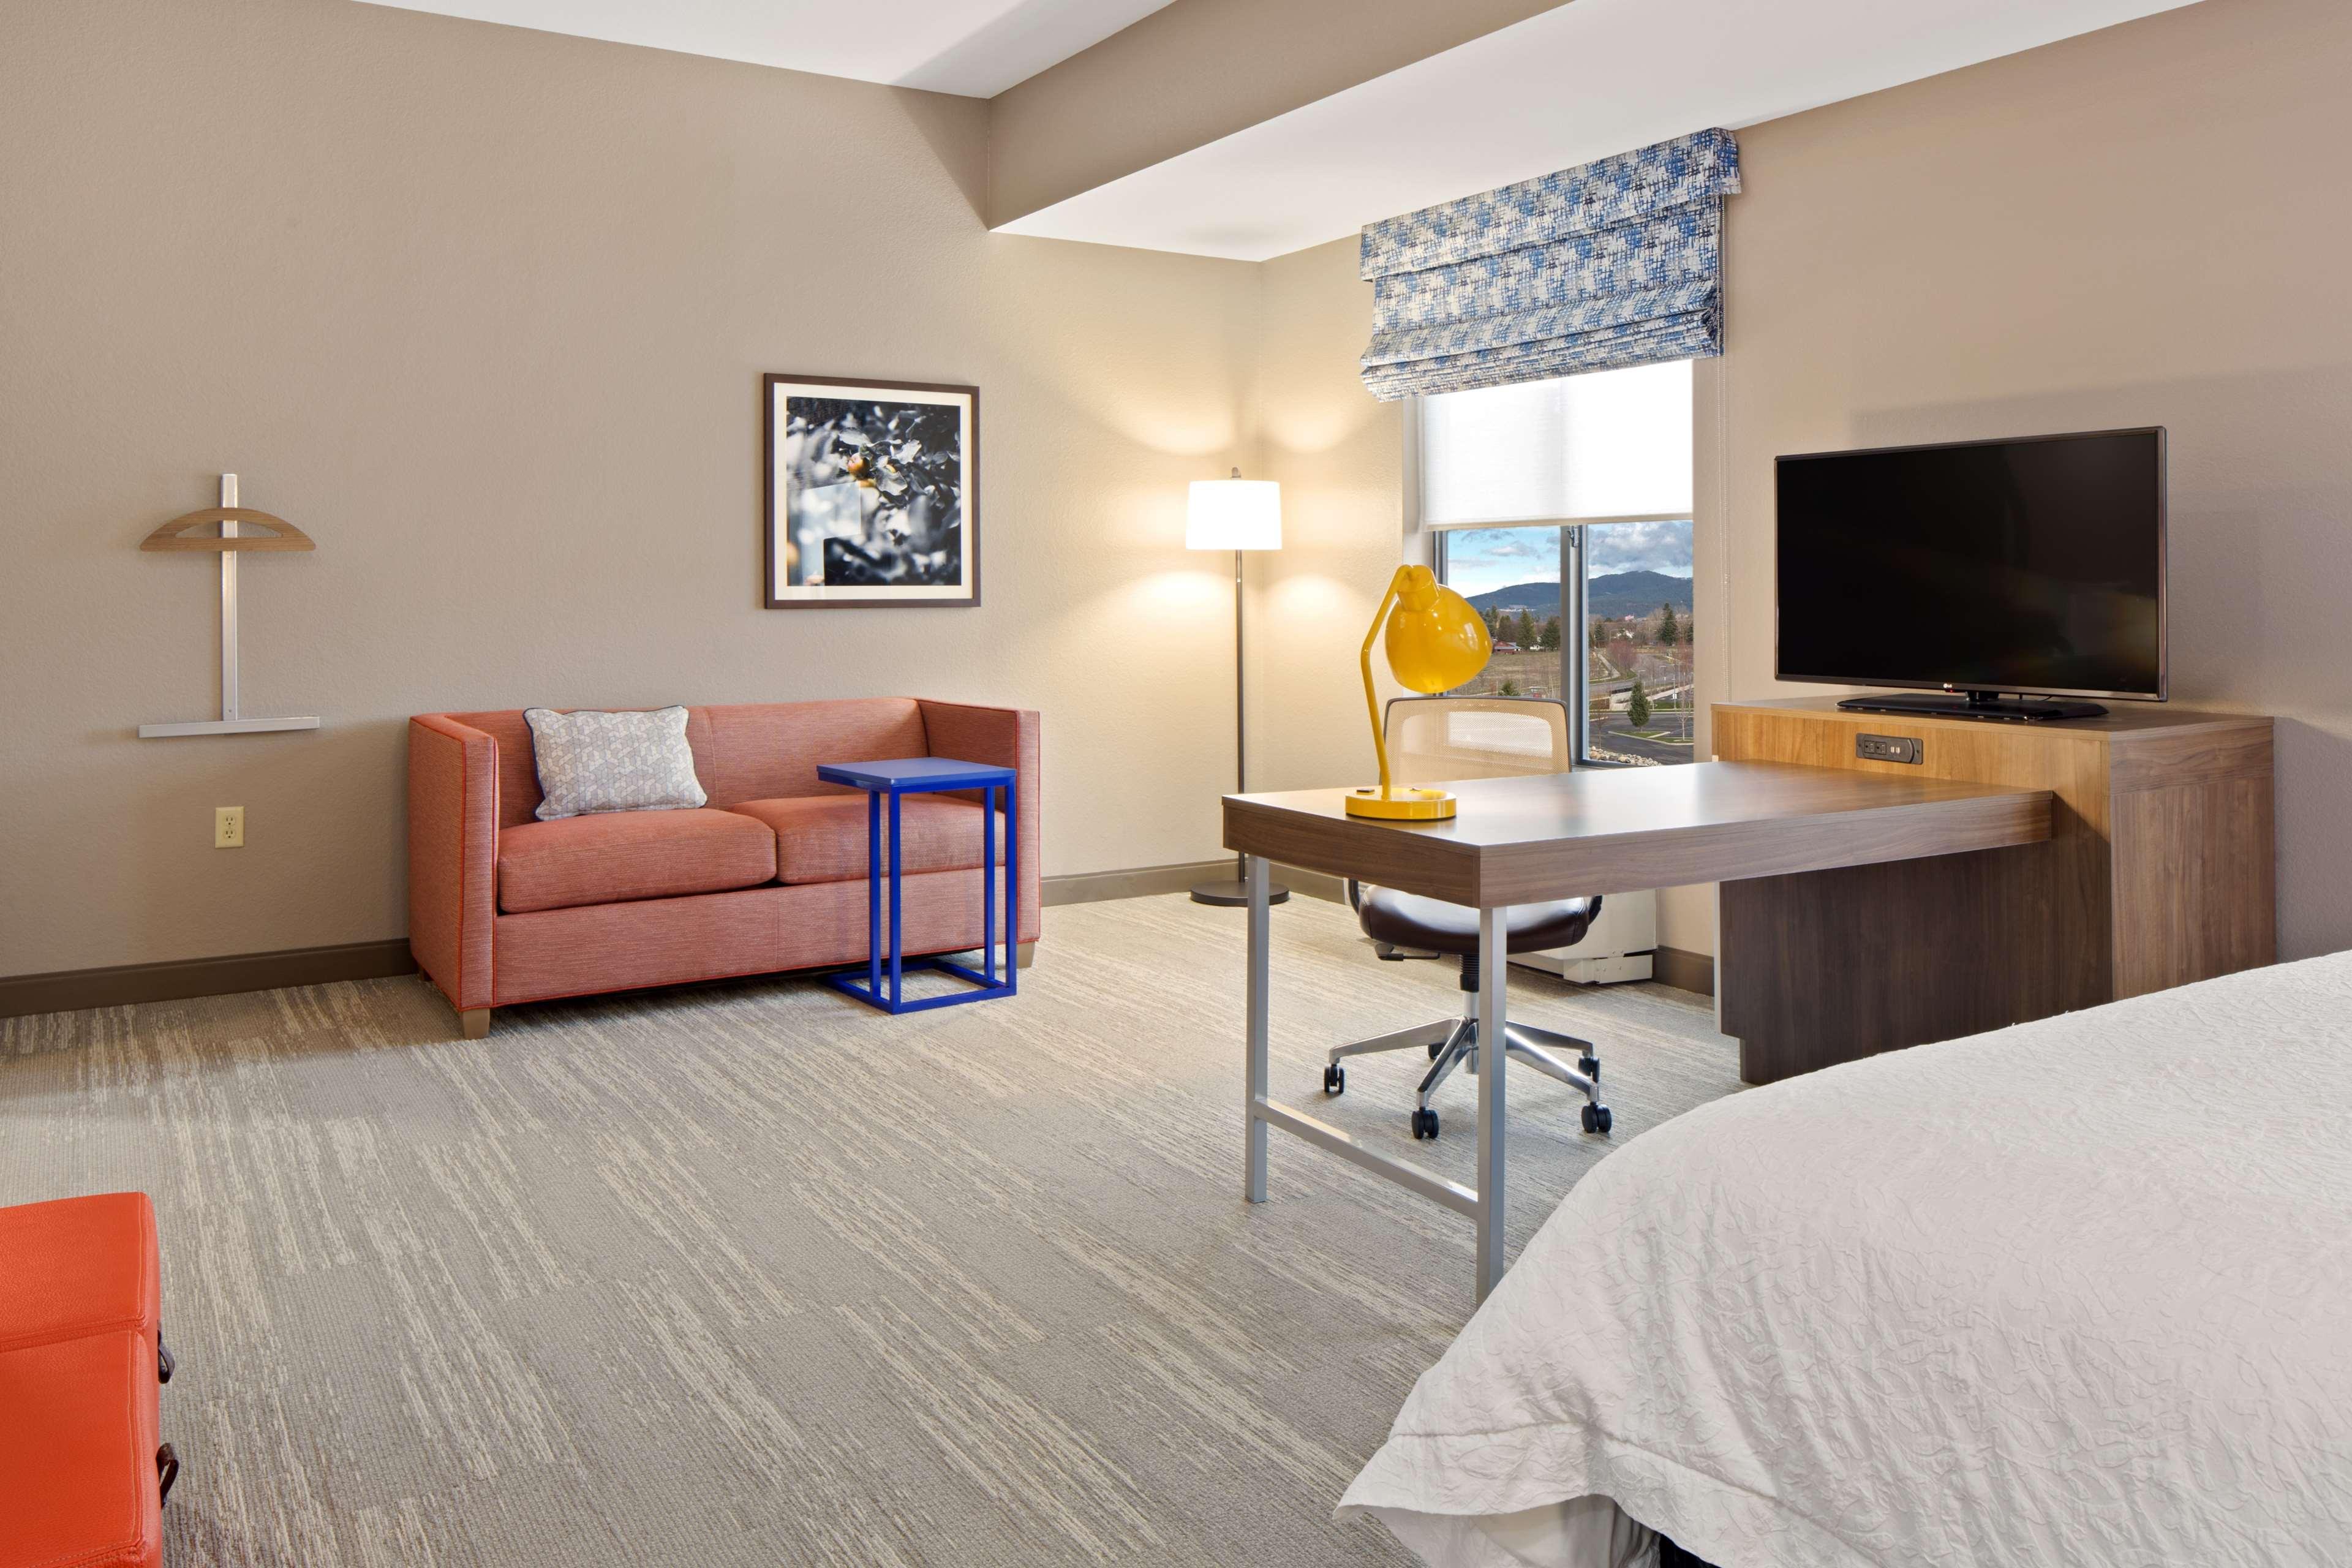 Hampton Inn & Suites Spokane Valley image 25